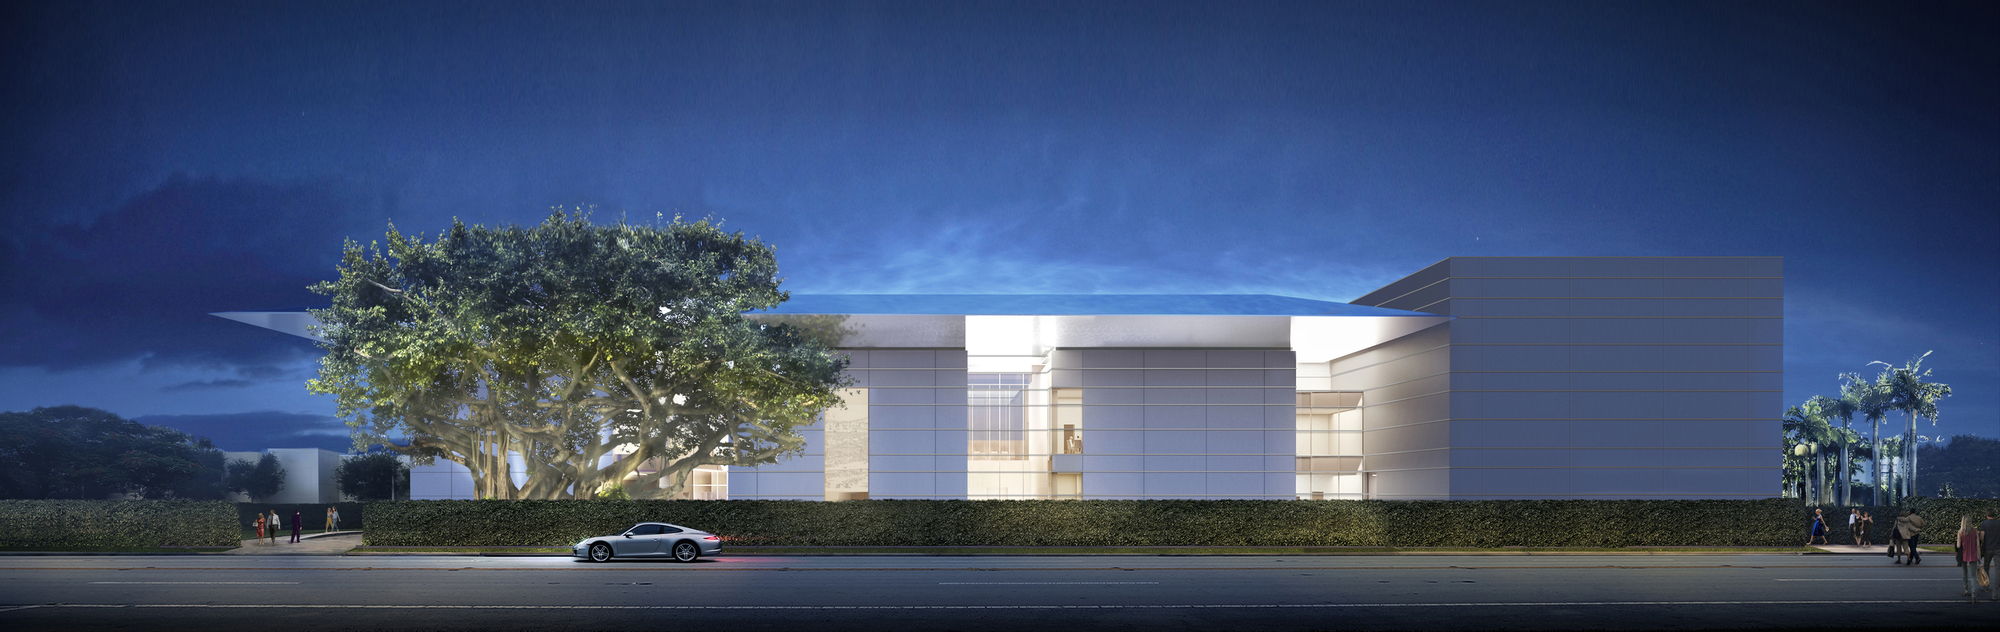 Palm Beach Art And Design Center